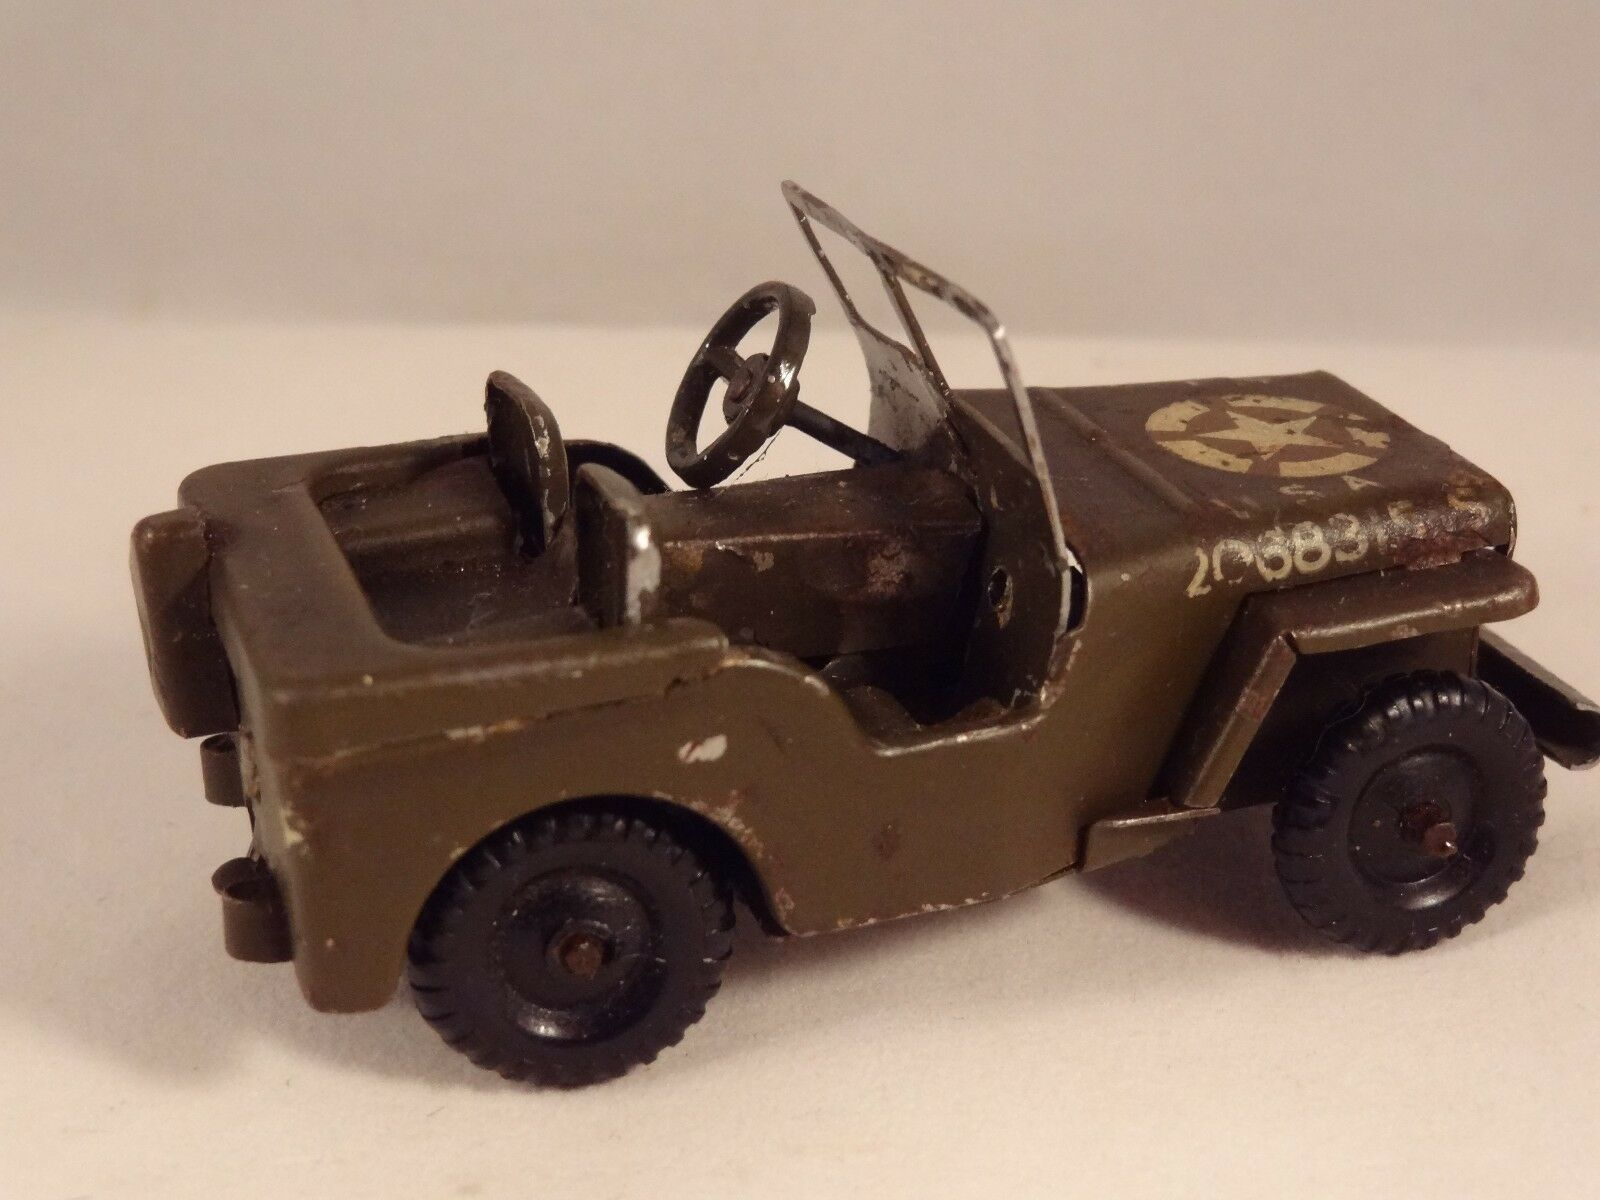 2nde Guerre Jeep Ancienne i Mécanique Voiture G y0v8nOmNwP